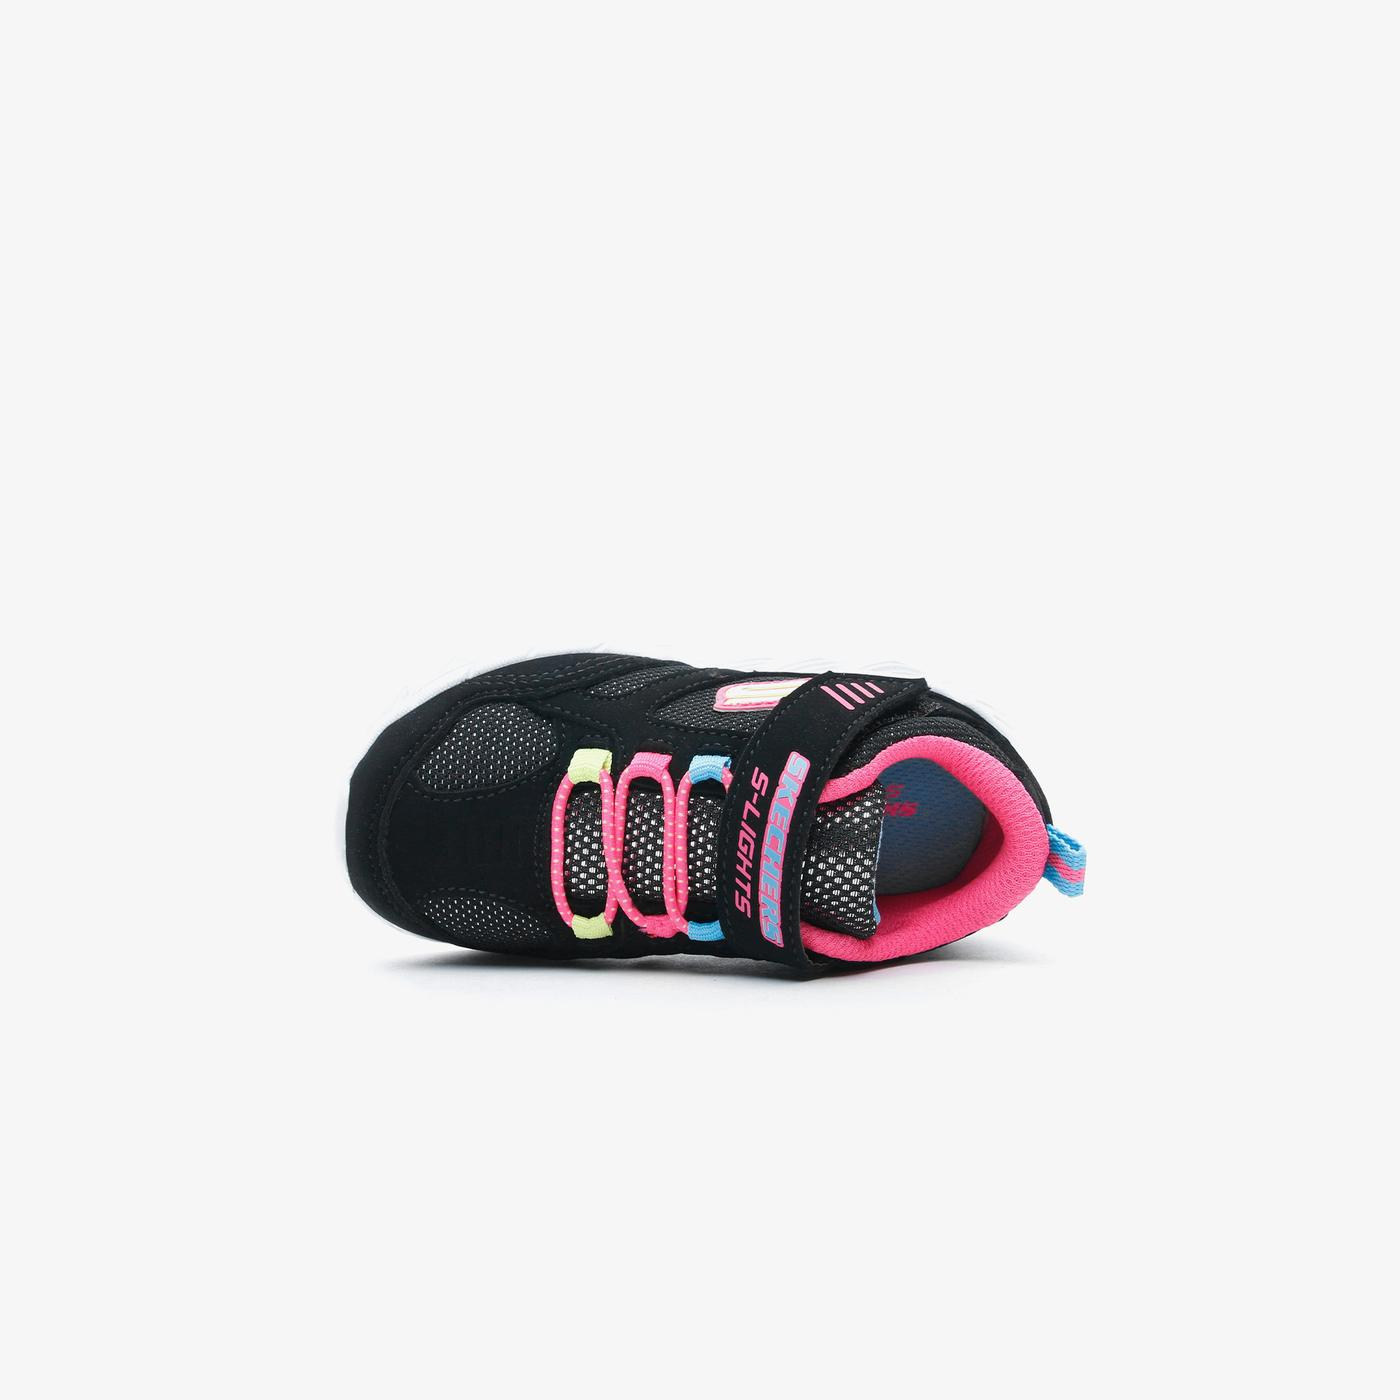 Skechers Magna Lights - Expert Level Bebek Siyah Spor Ayakkabı